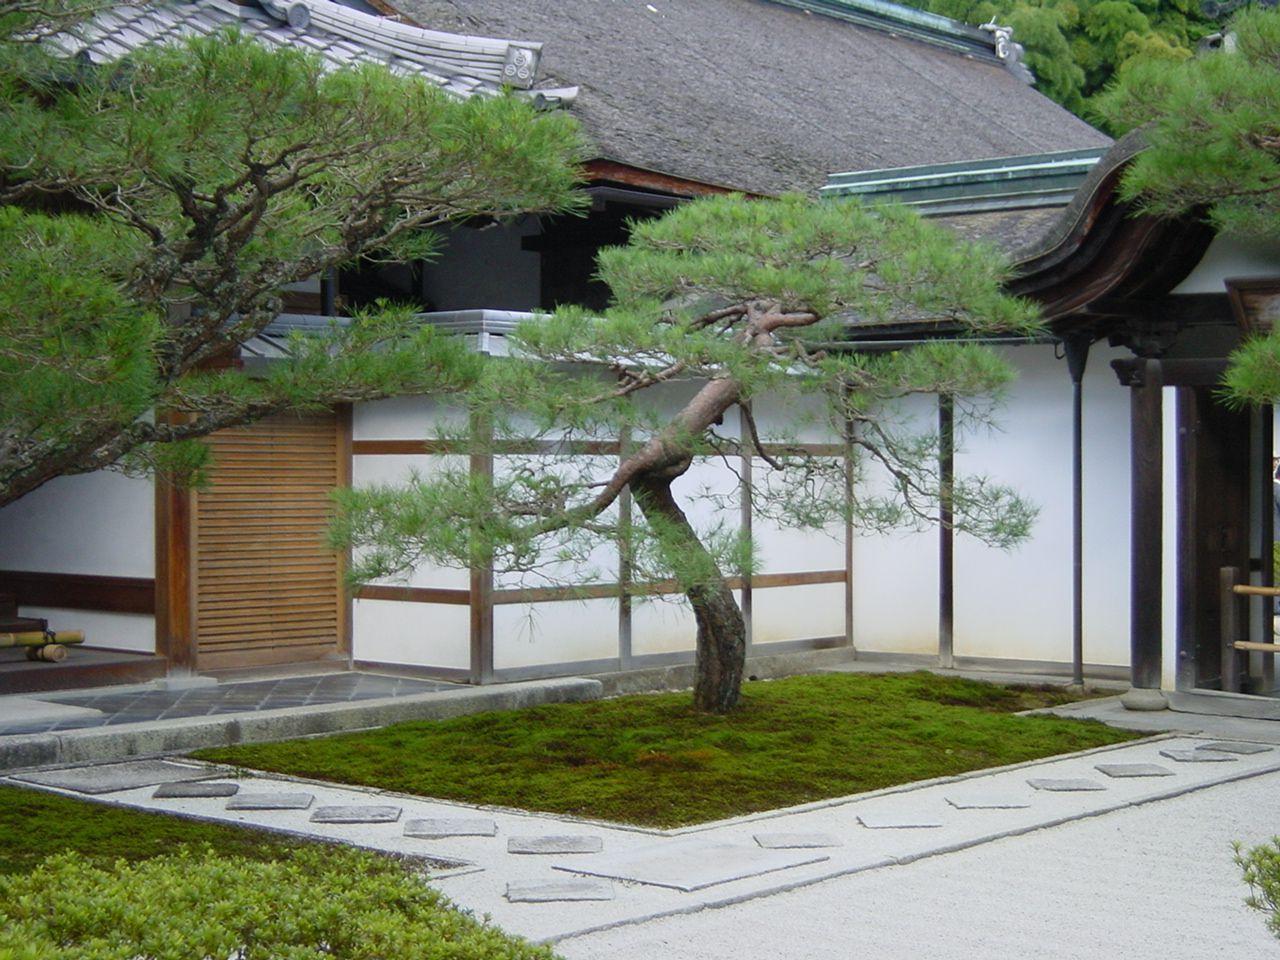 In home garden ideas  Backyard Patio Ideas With Garden Stunning Japanese Court Yard